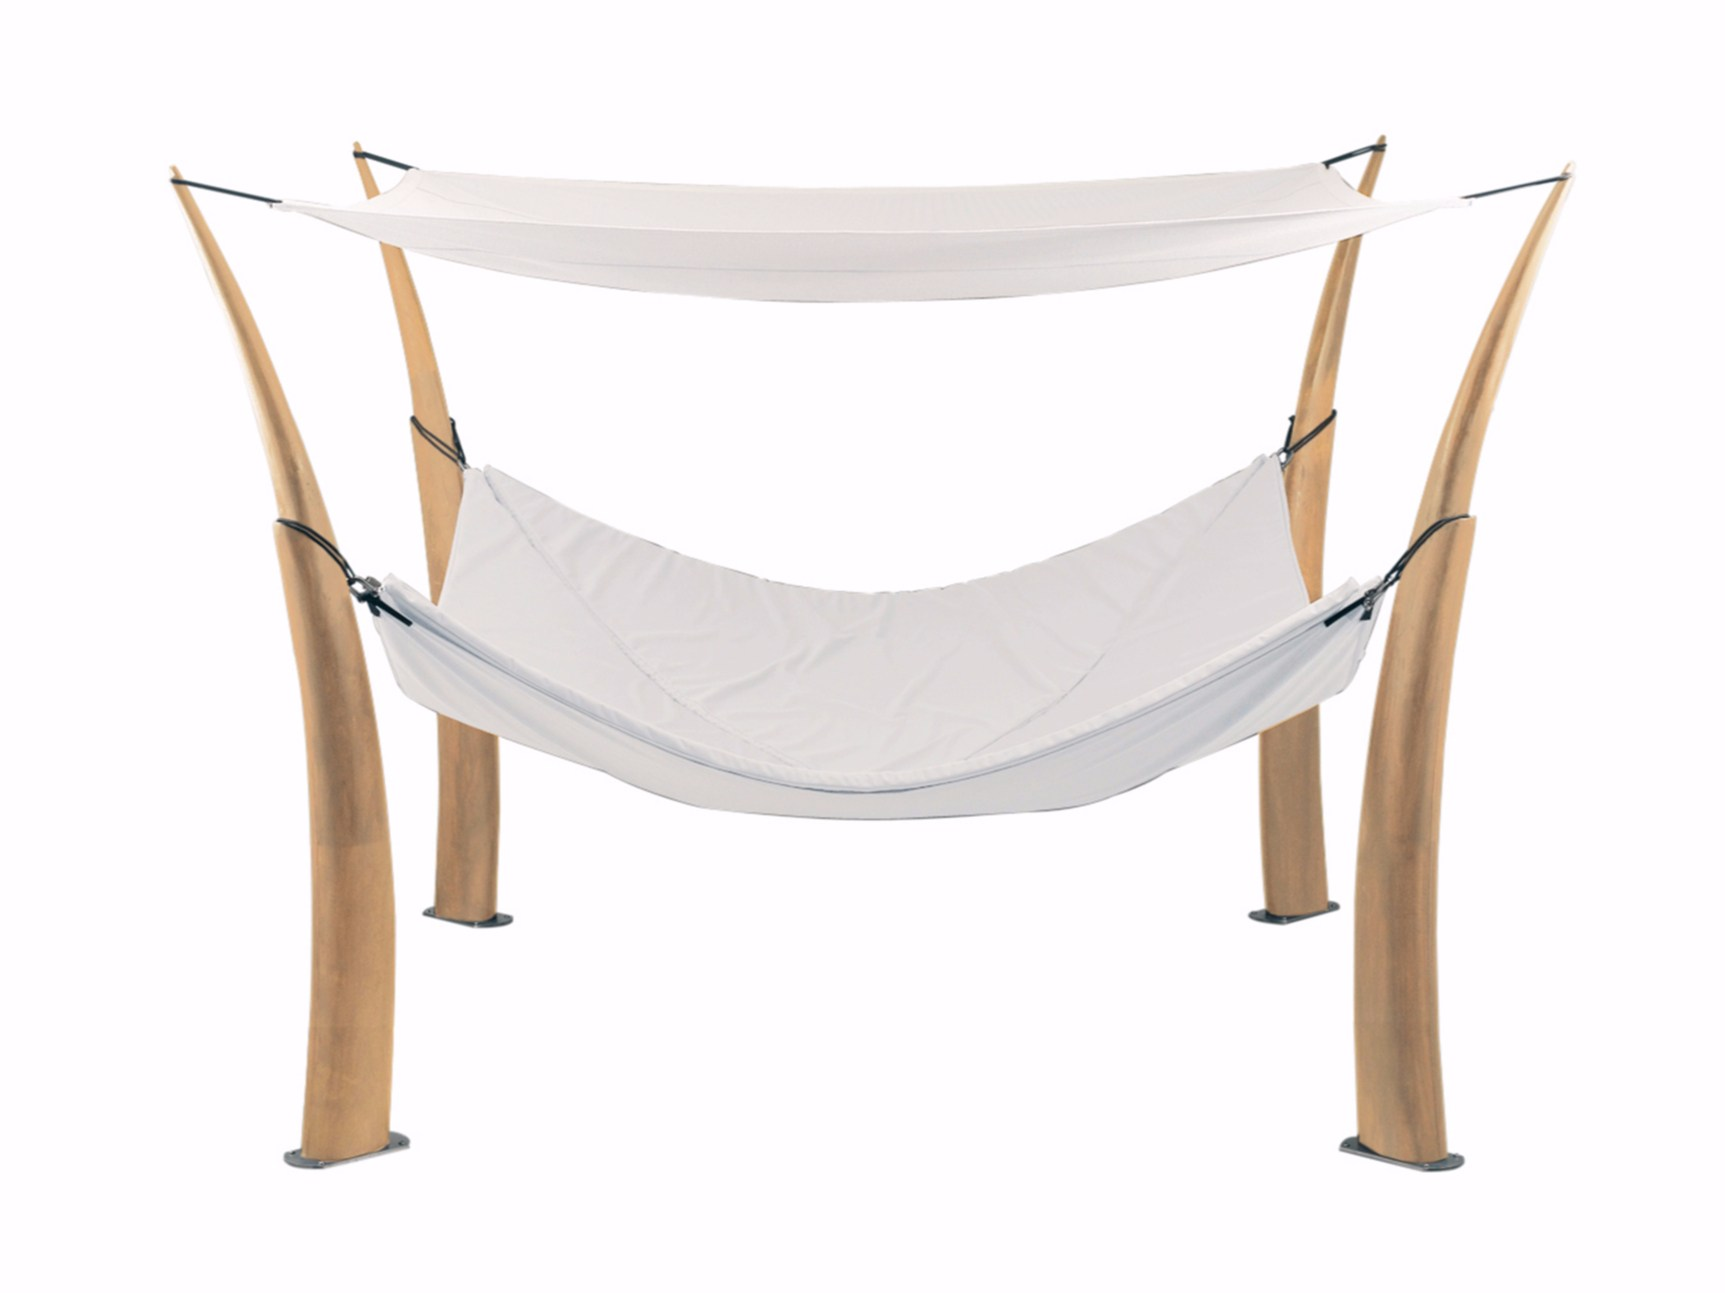 double canopy batyline garden bed kokoon by royal botania